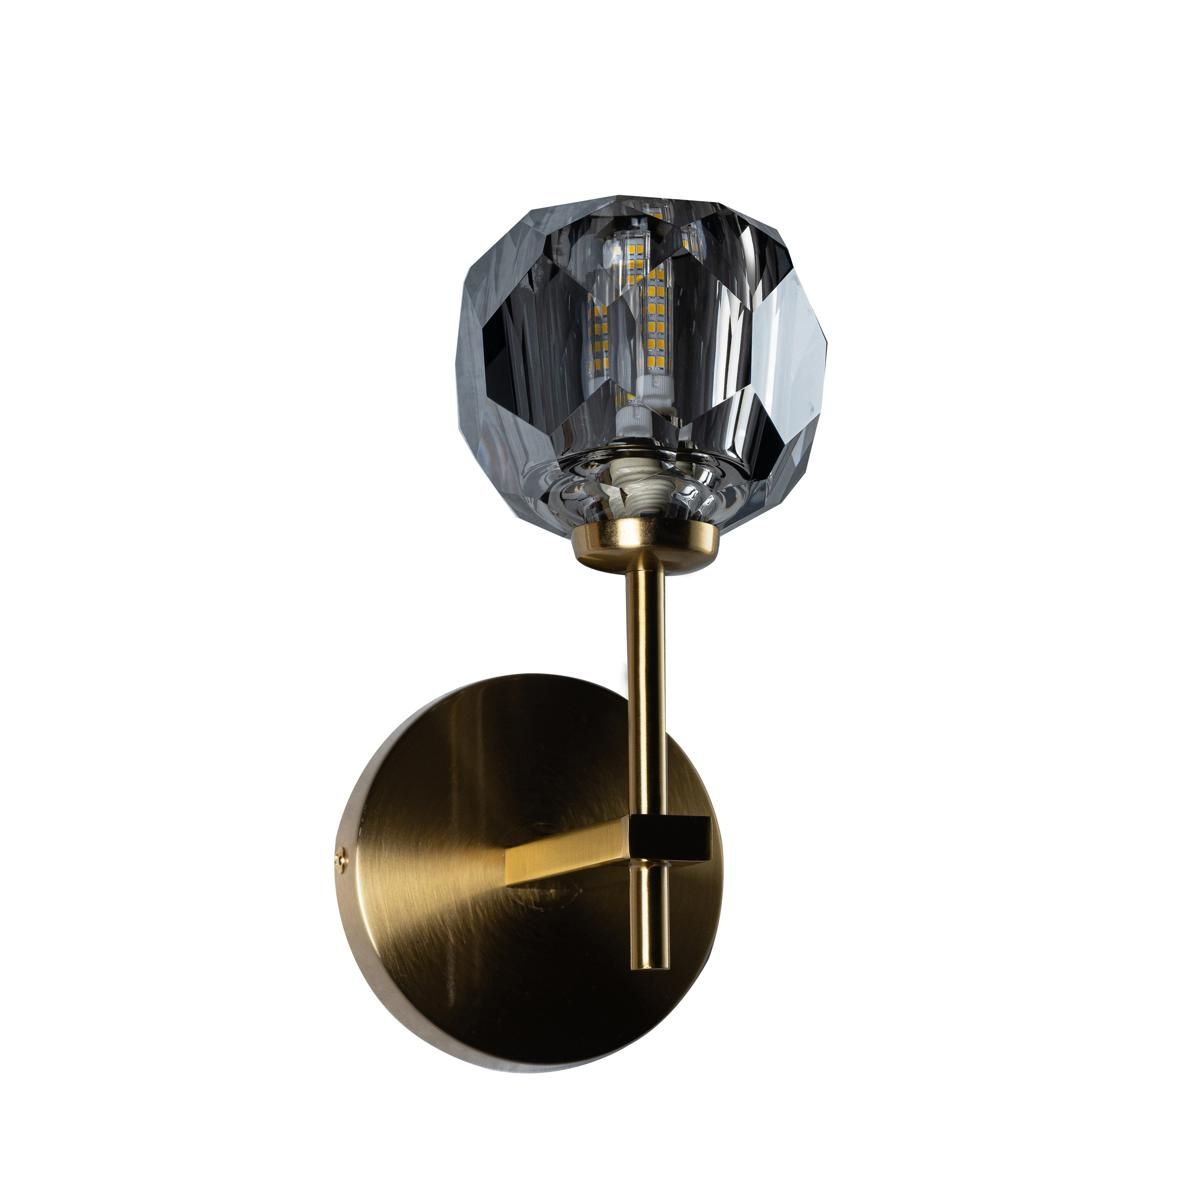 Бра Loft IT 10021/1W Orion Smoky светильник настенный loft it orion smoky 10021 1w g9 12w